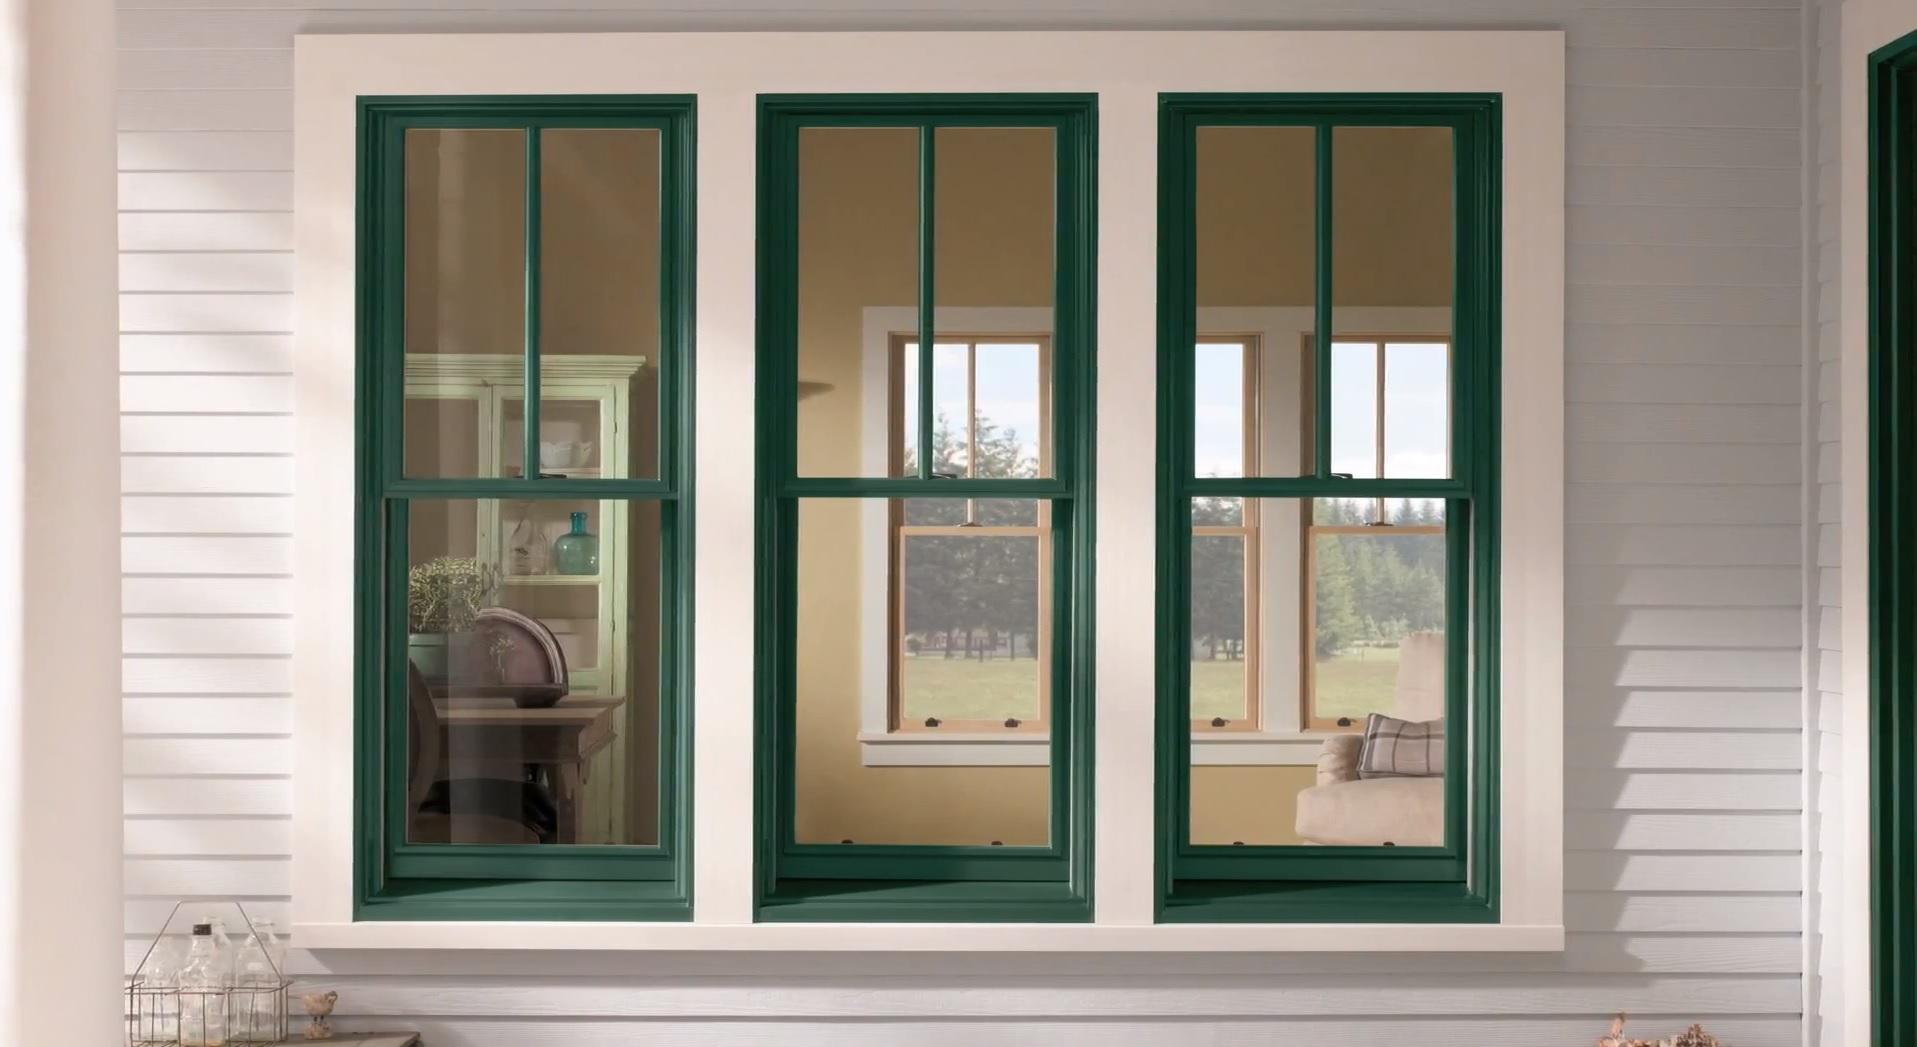 House Window Images - Unique outside house window house window